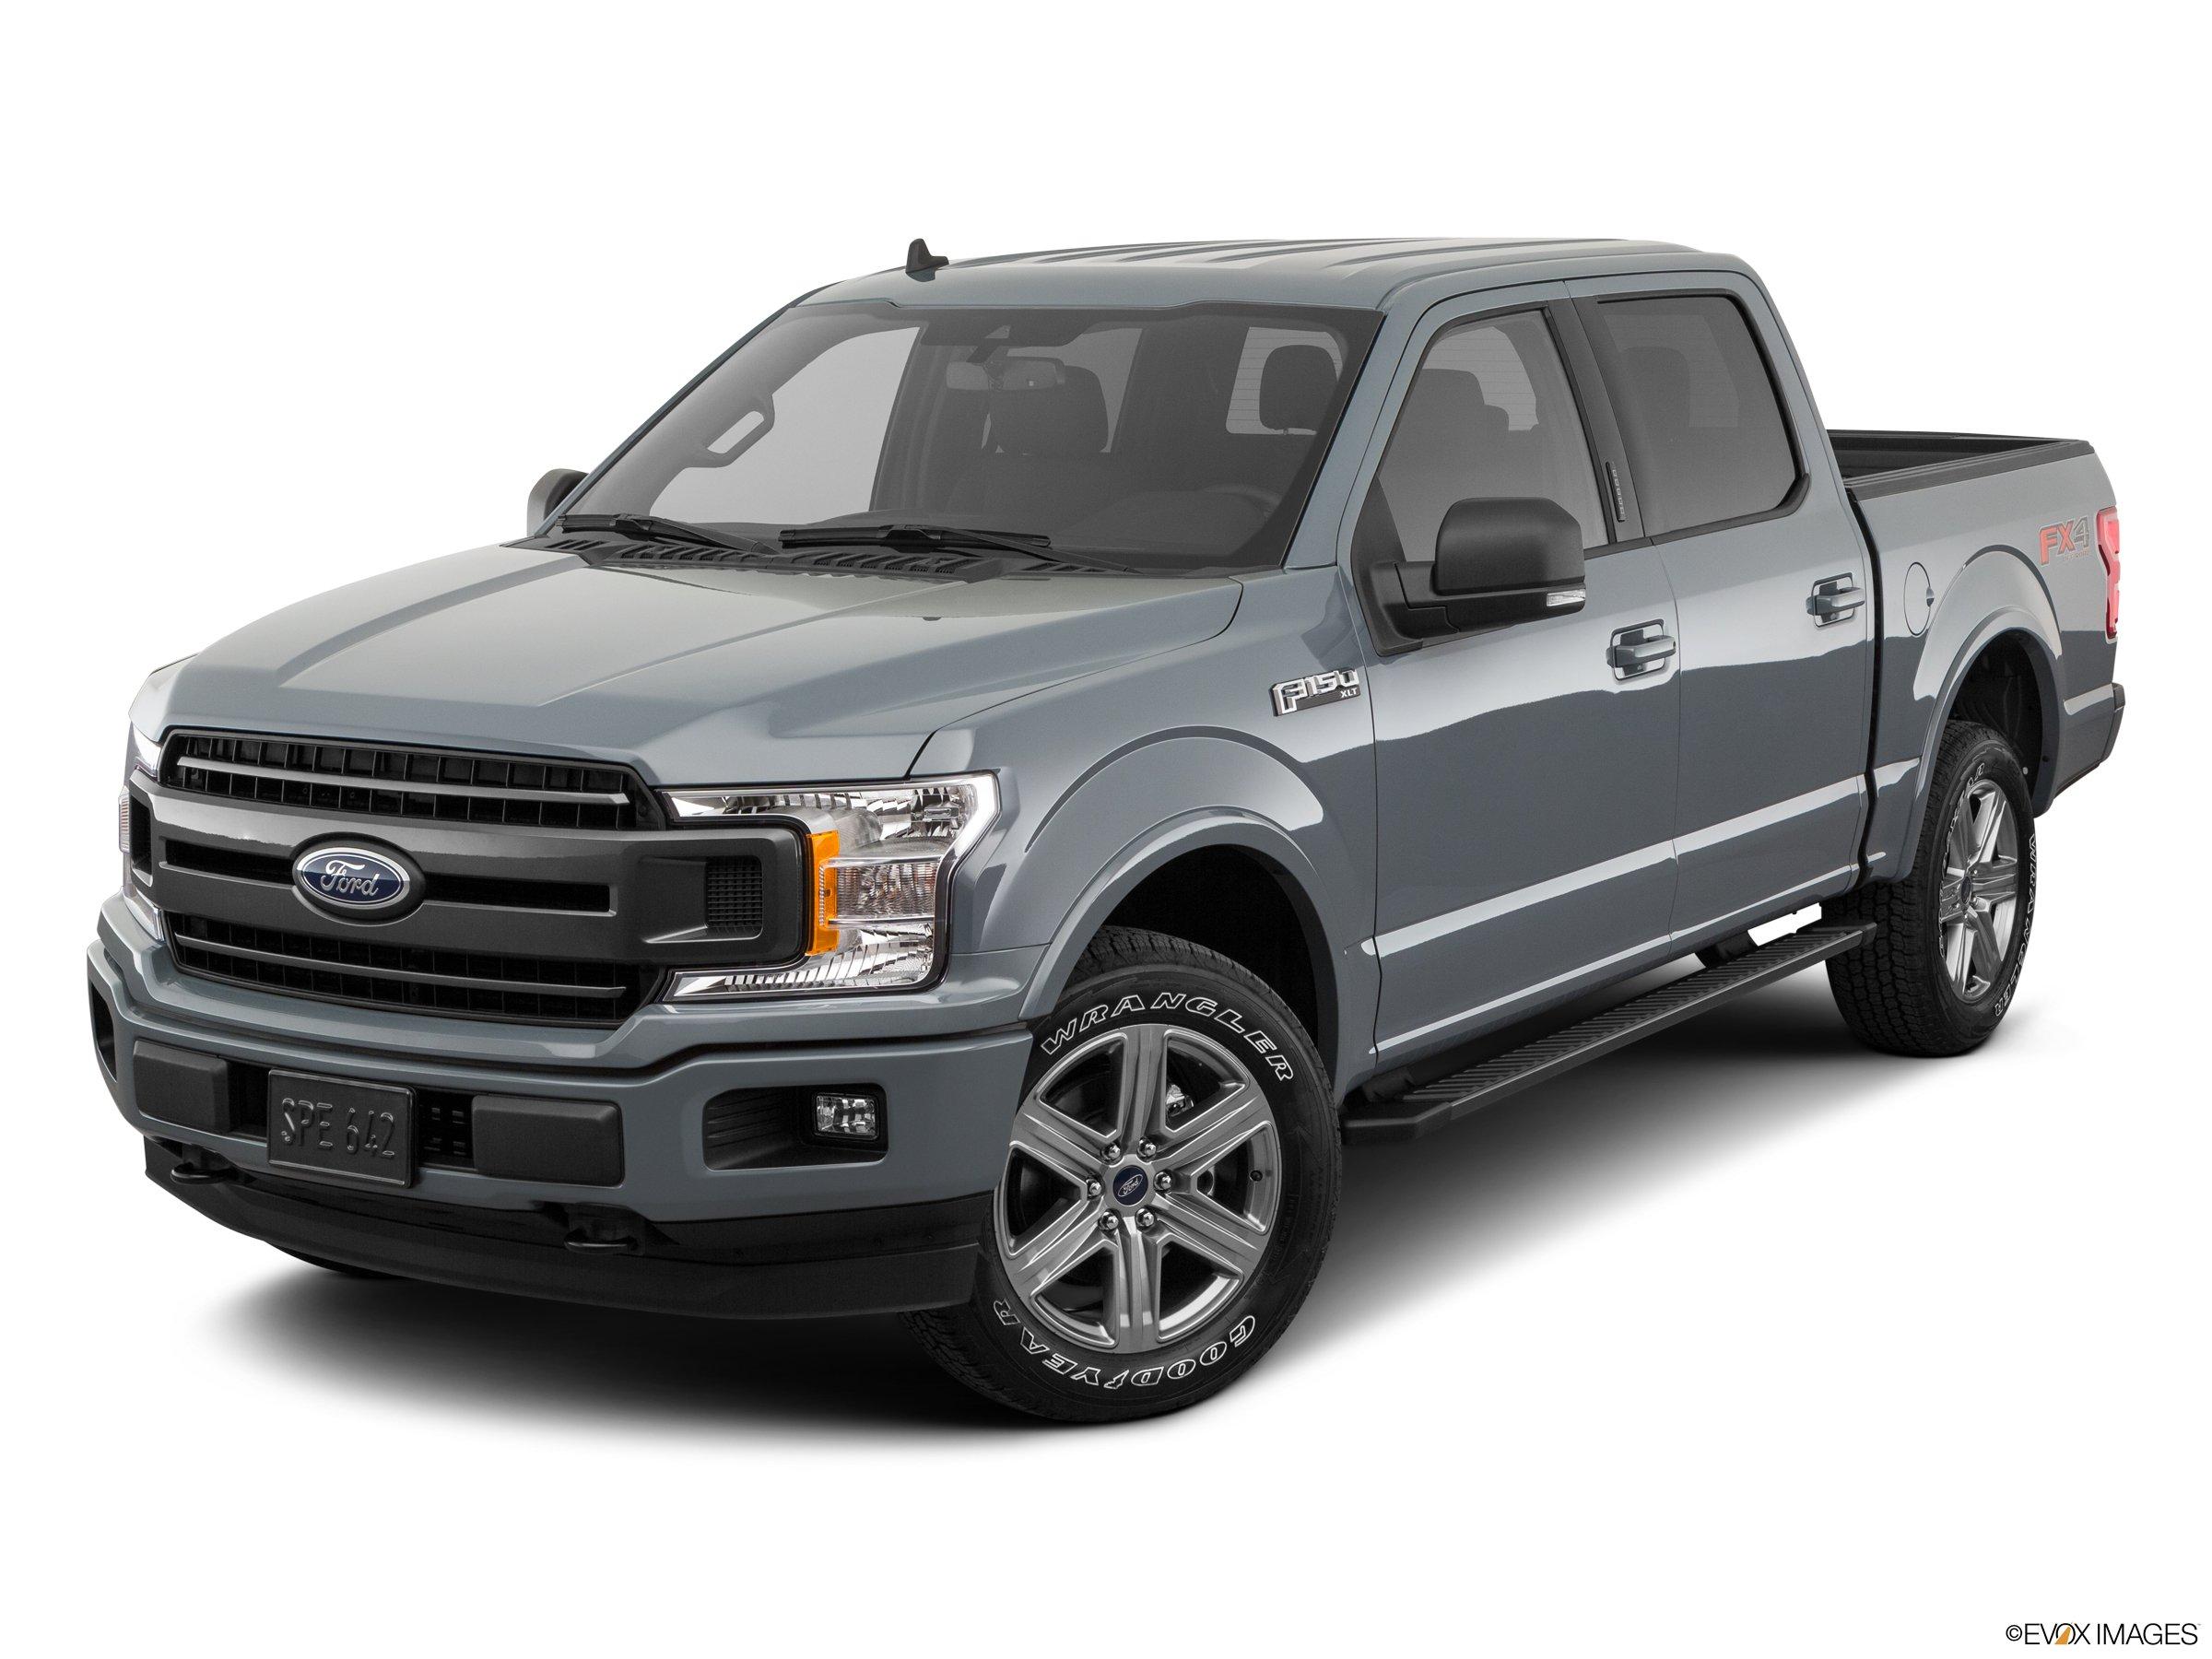 2020 Ford F-150 XLT 4×4 pickup